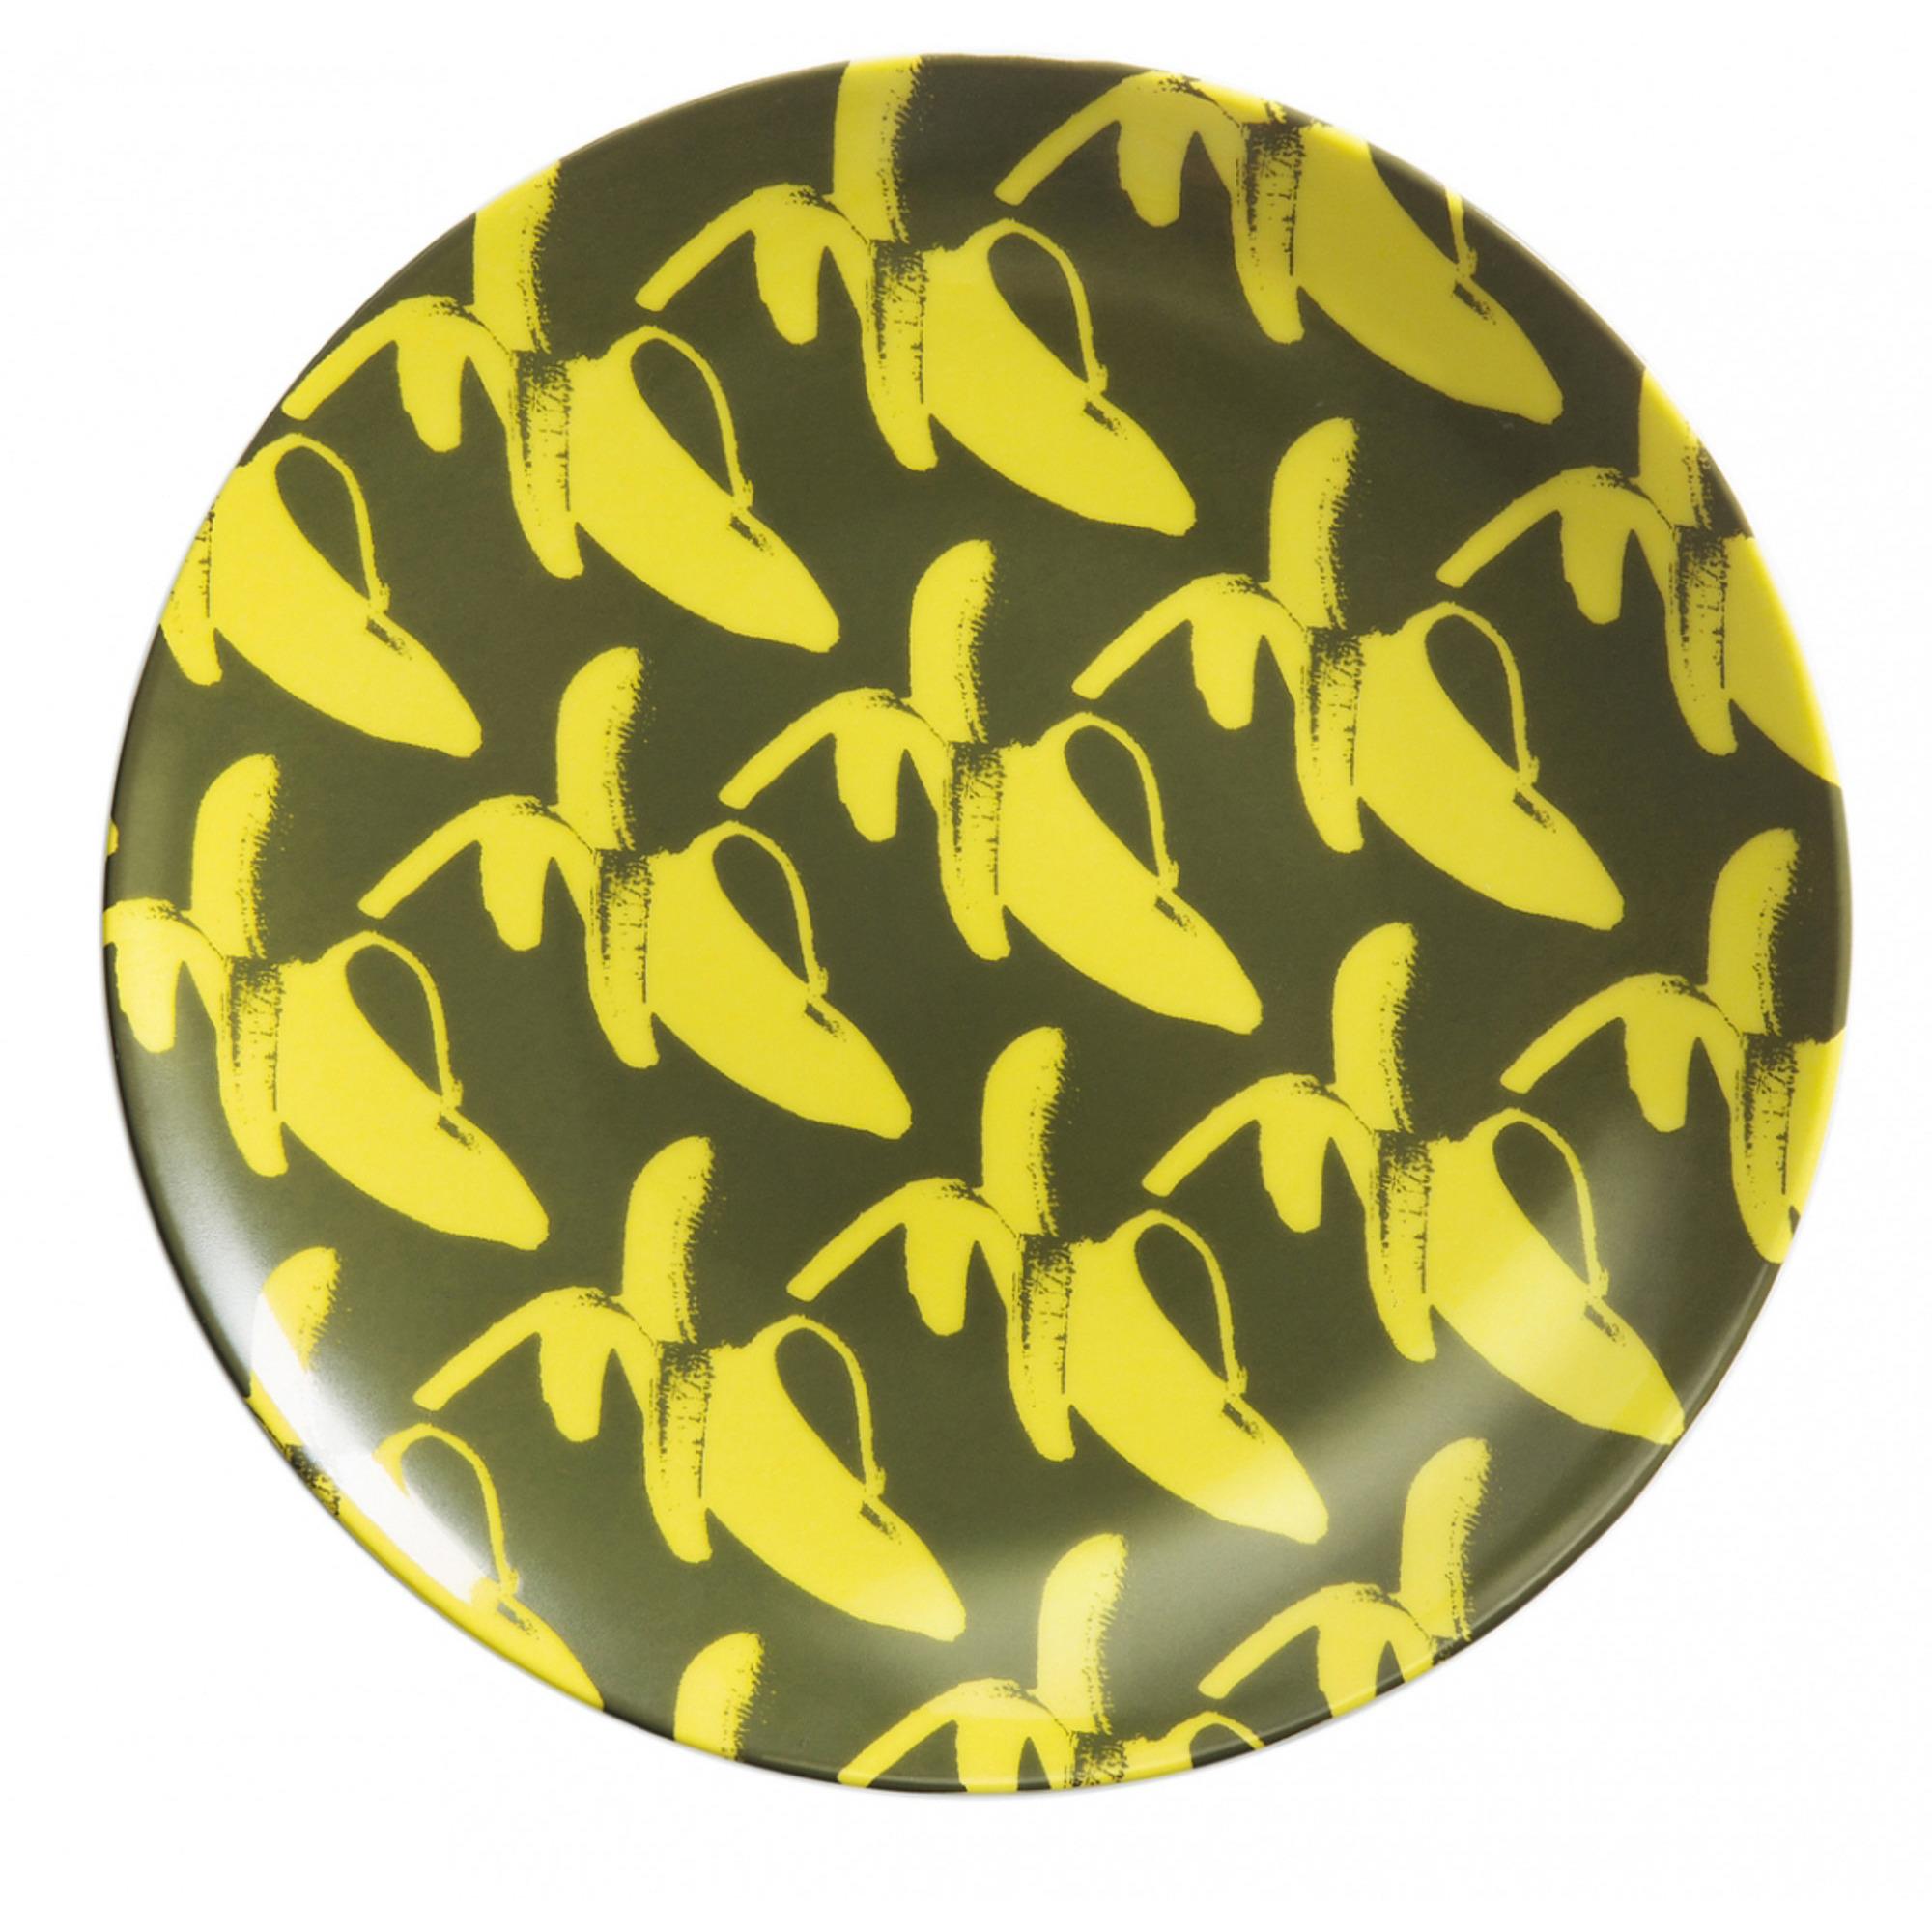 Lisa Bengtsson Porslinstallrik 20 cm GO BANANAS! Yellow Fellow